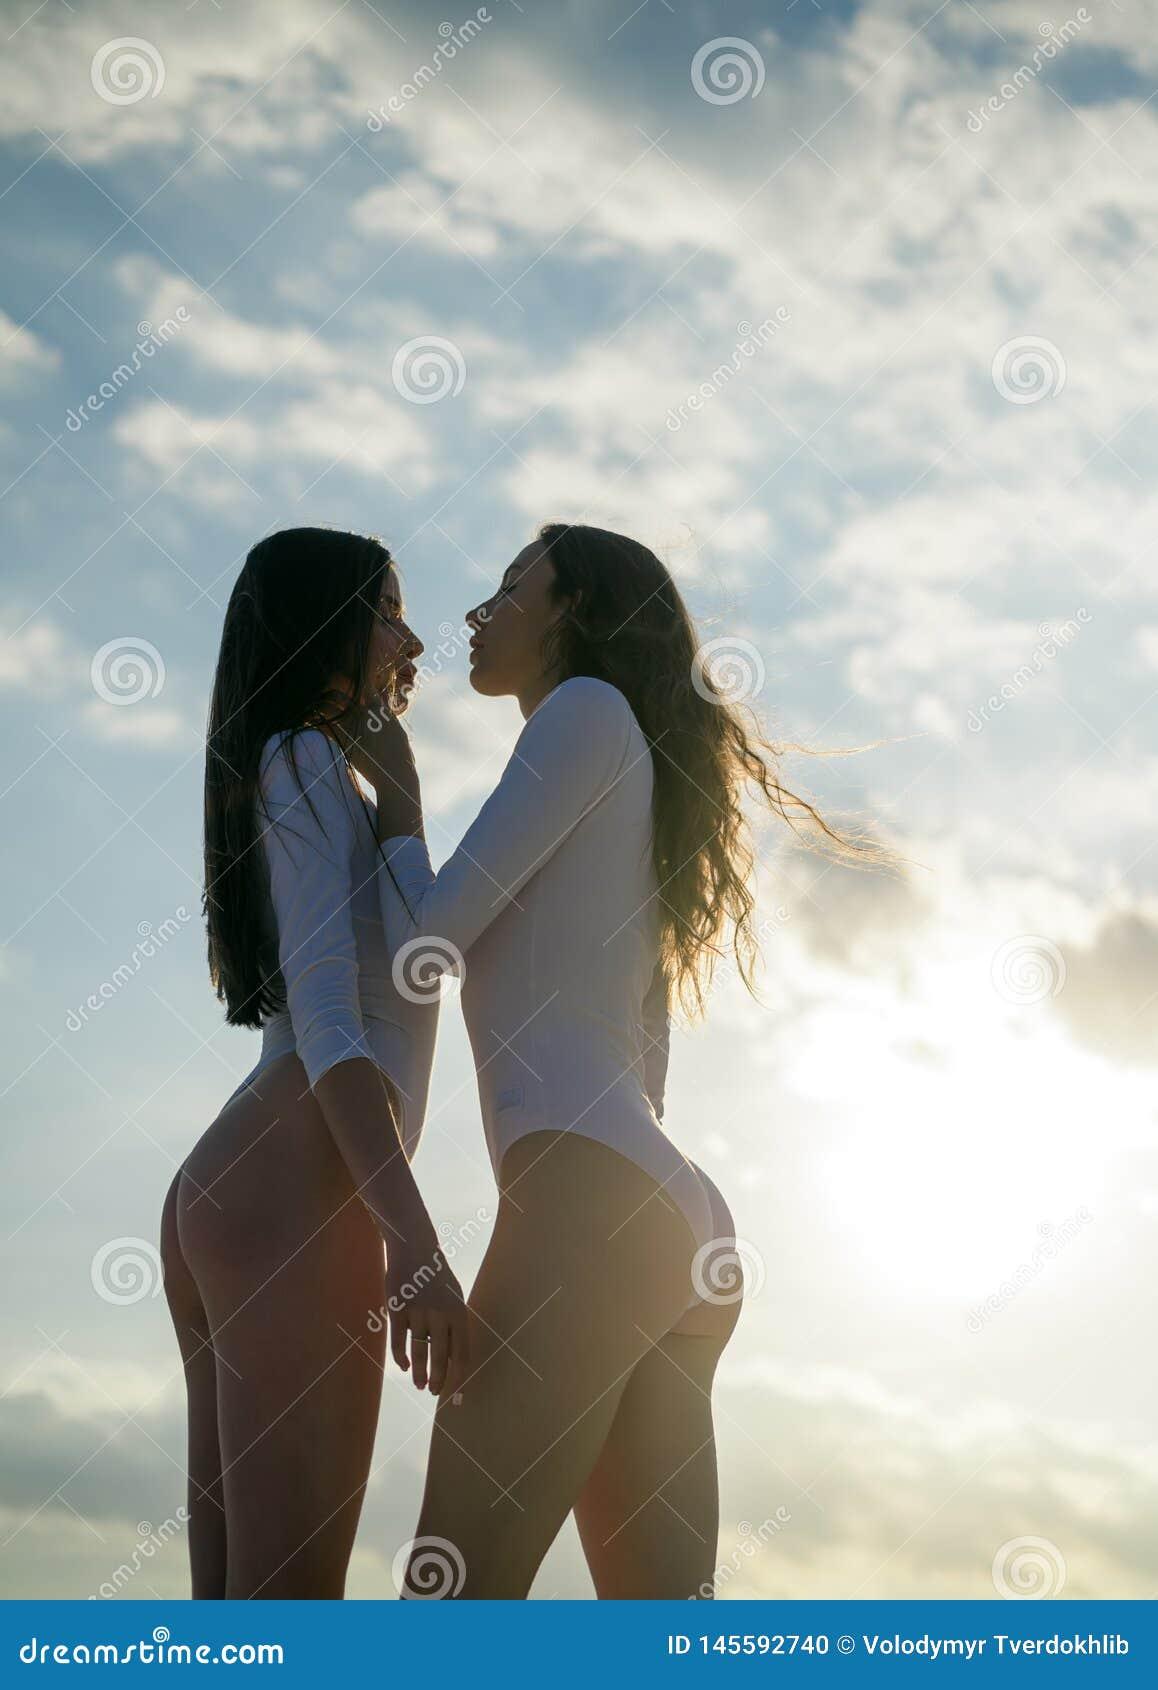 Best partner capricorn woman